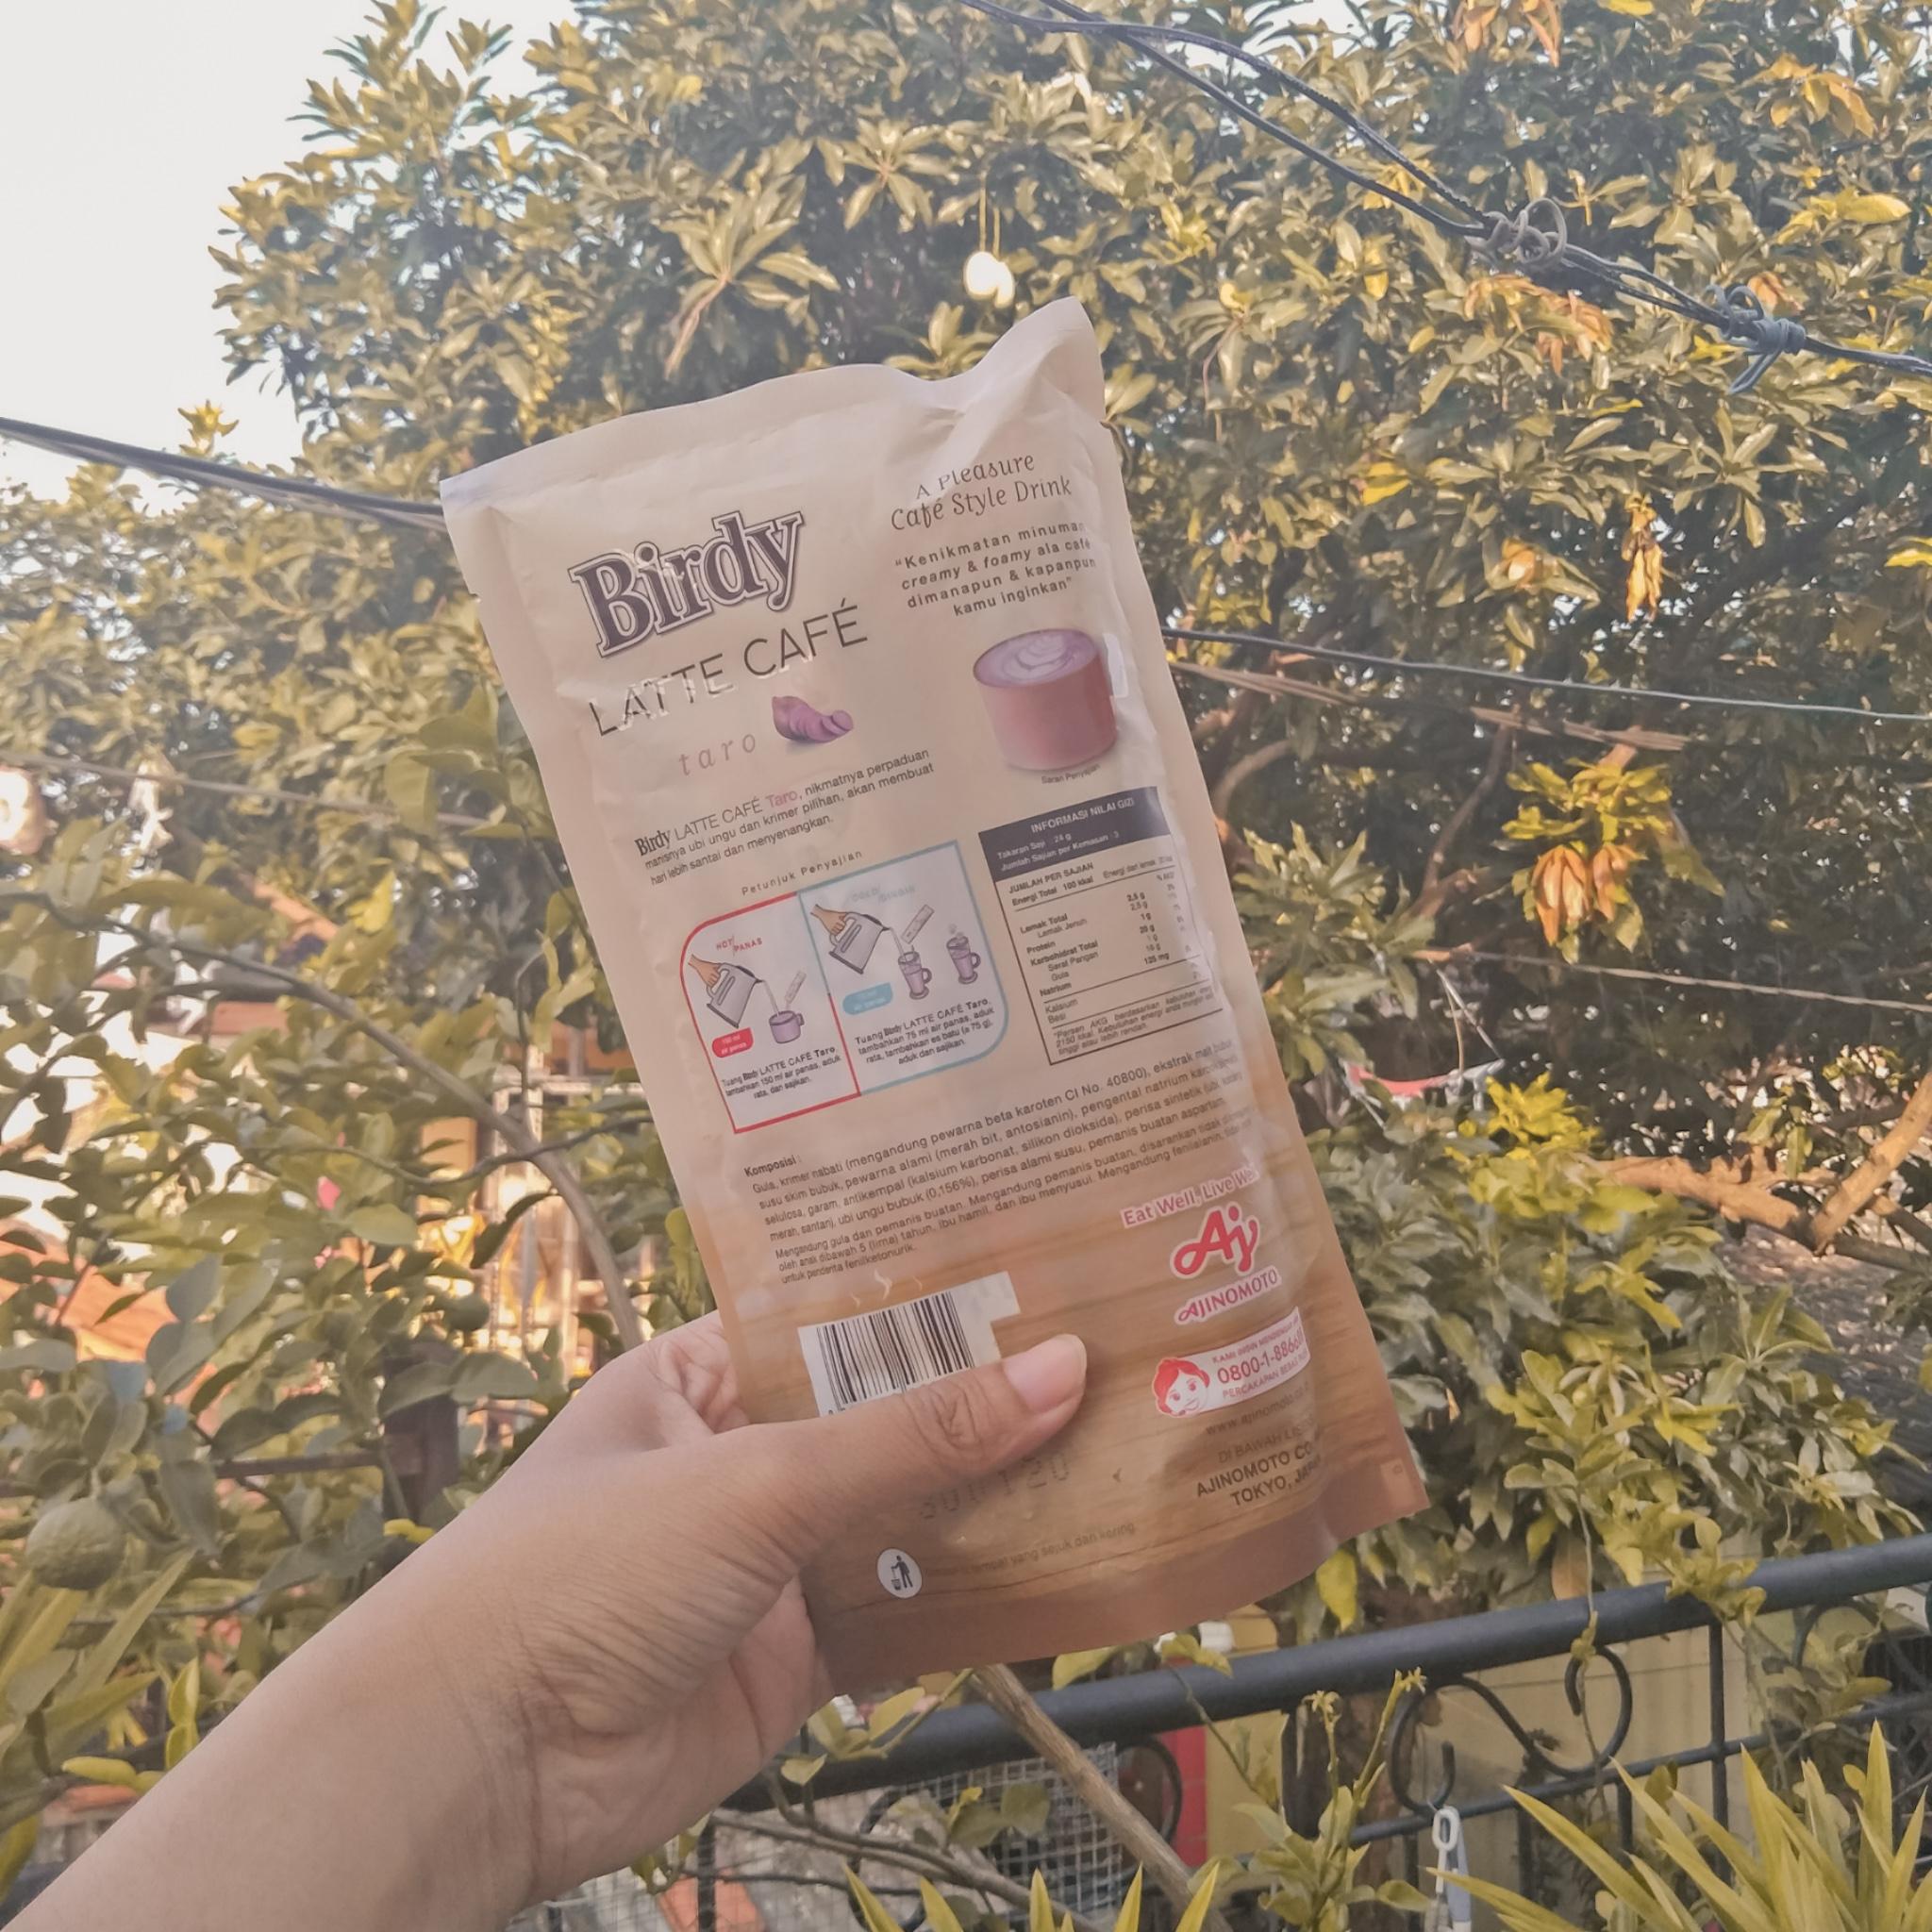 gambar review ke-2 untuk Birdy Cafe Late - Taro